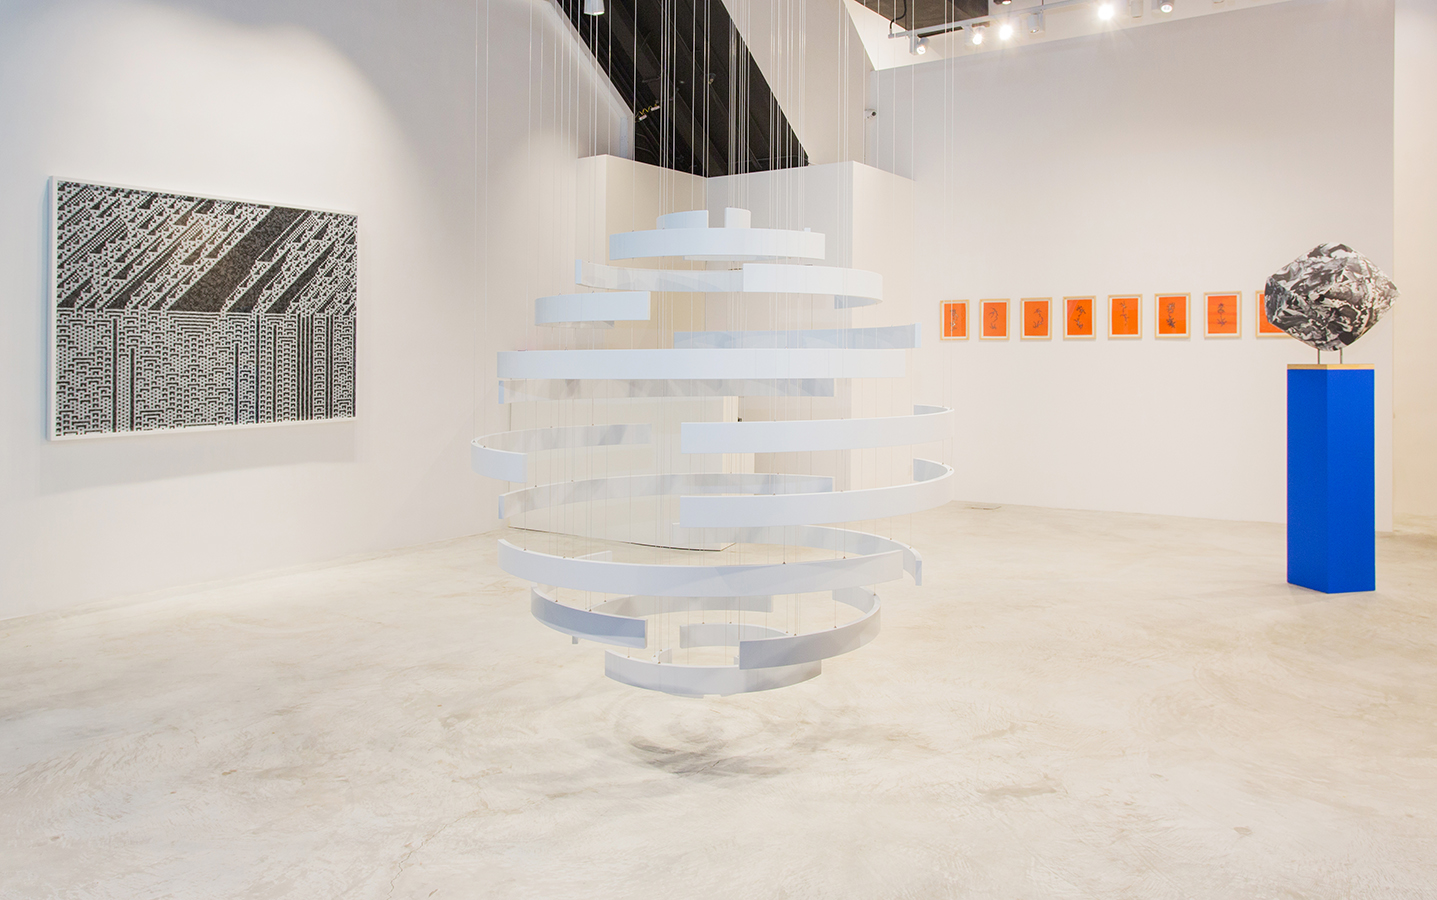 'The Sum of All Possibilities', 2014 | Troika (Eva Rucki, Sebastien Noel, Conny Freyer)